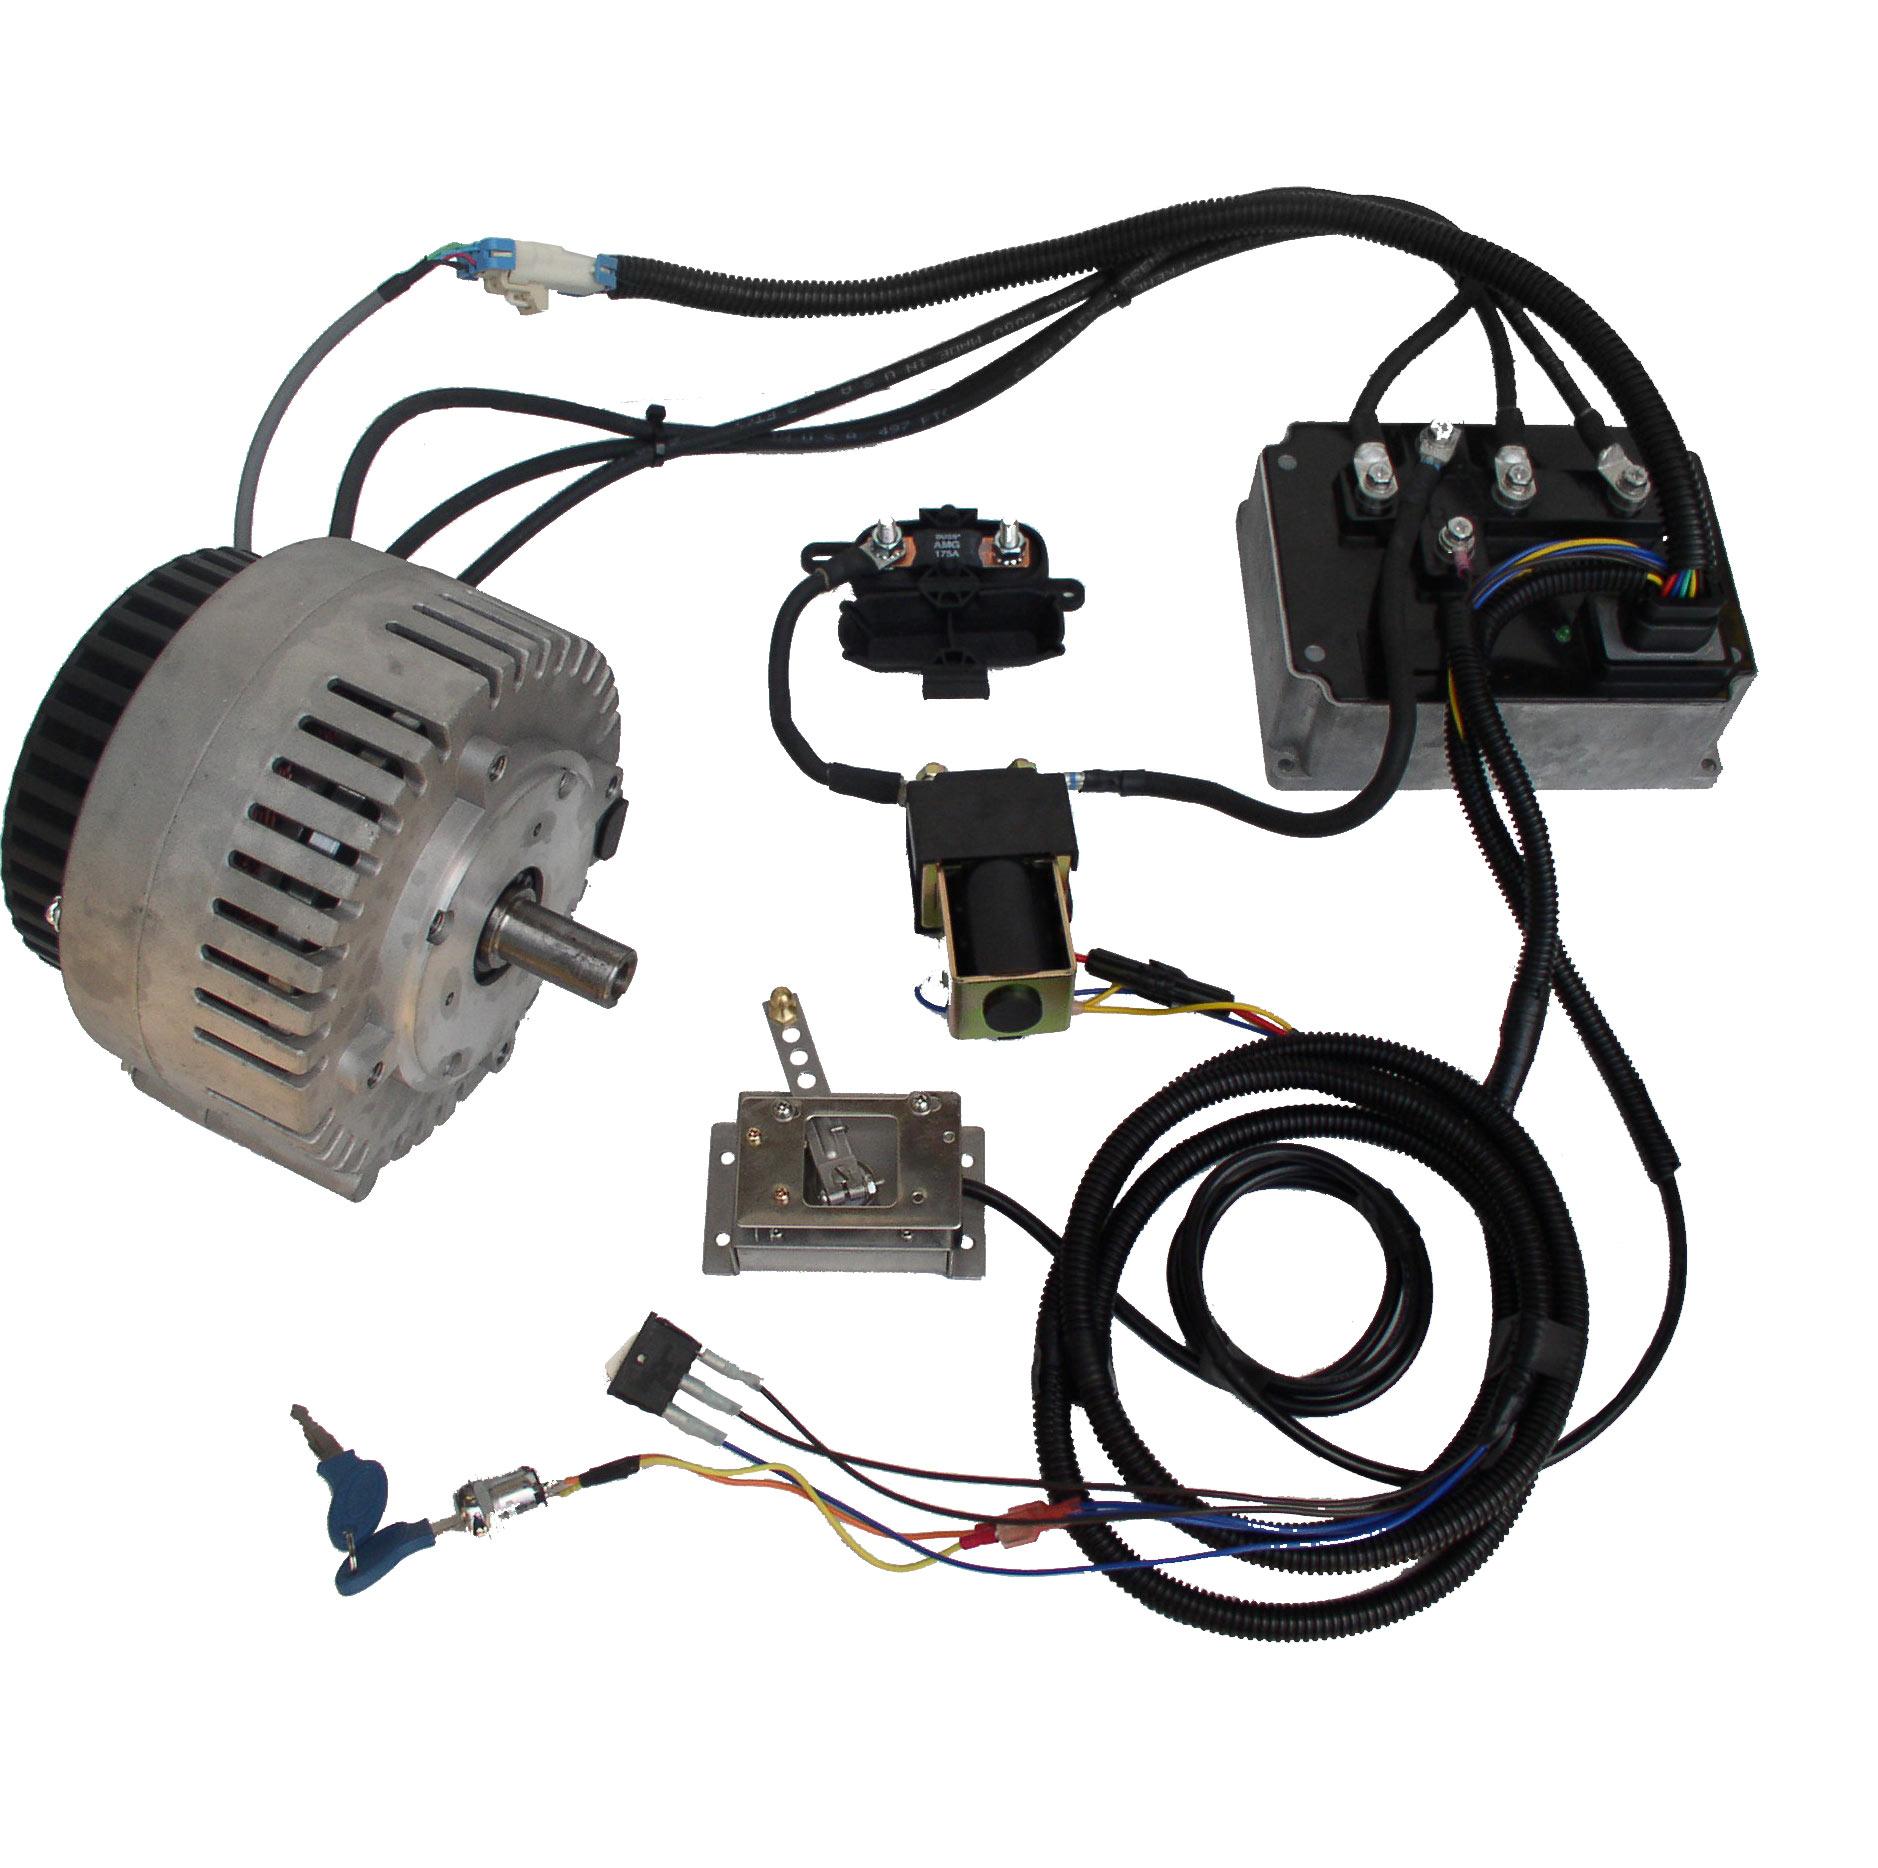 Etek motor weight for 15 hp brushless electric motor